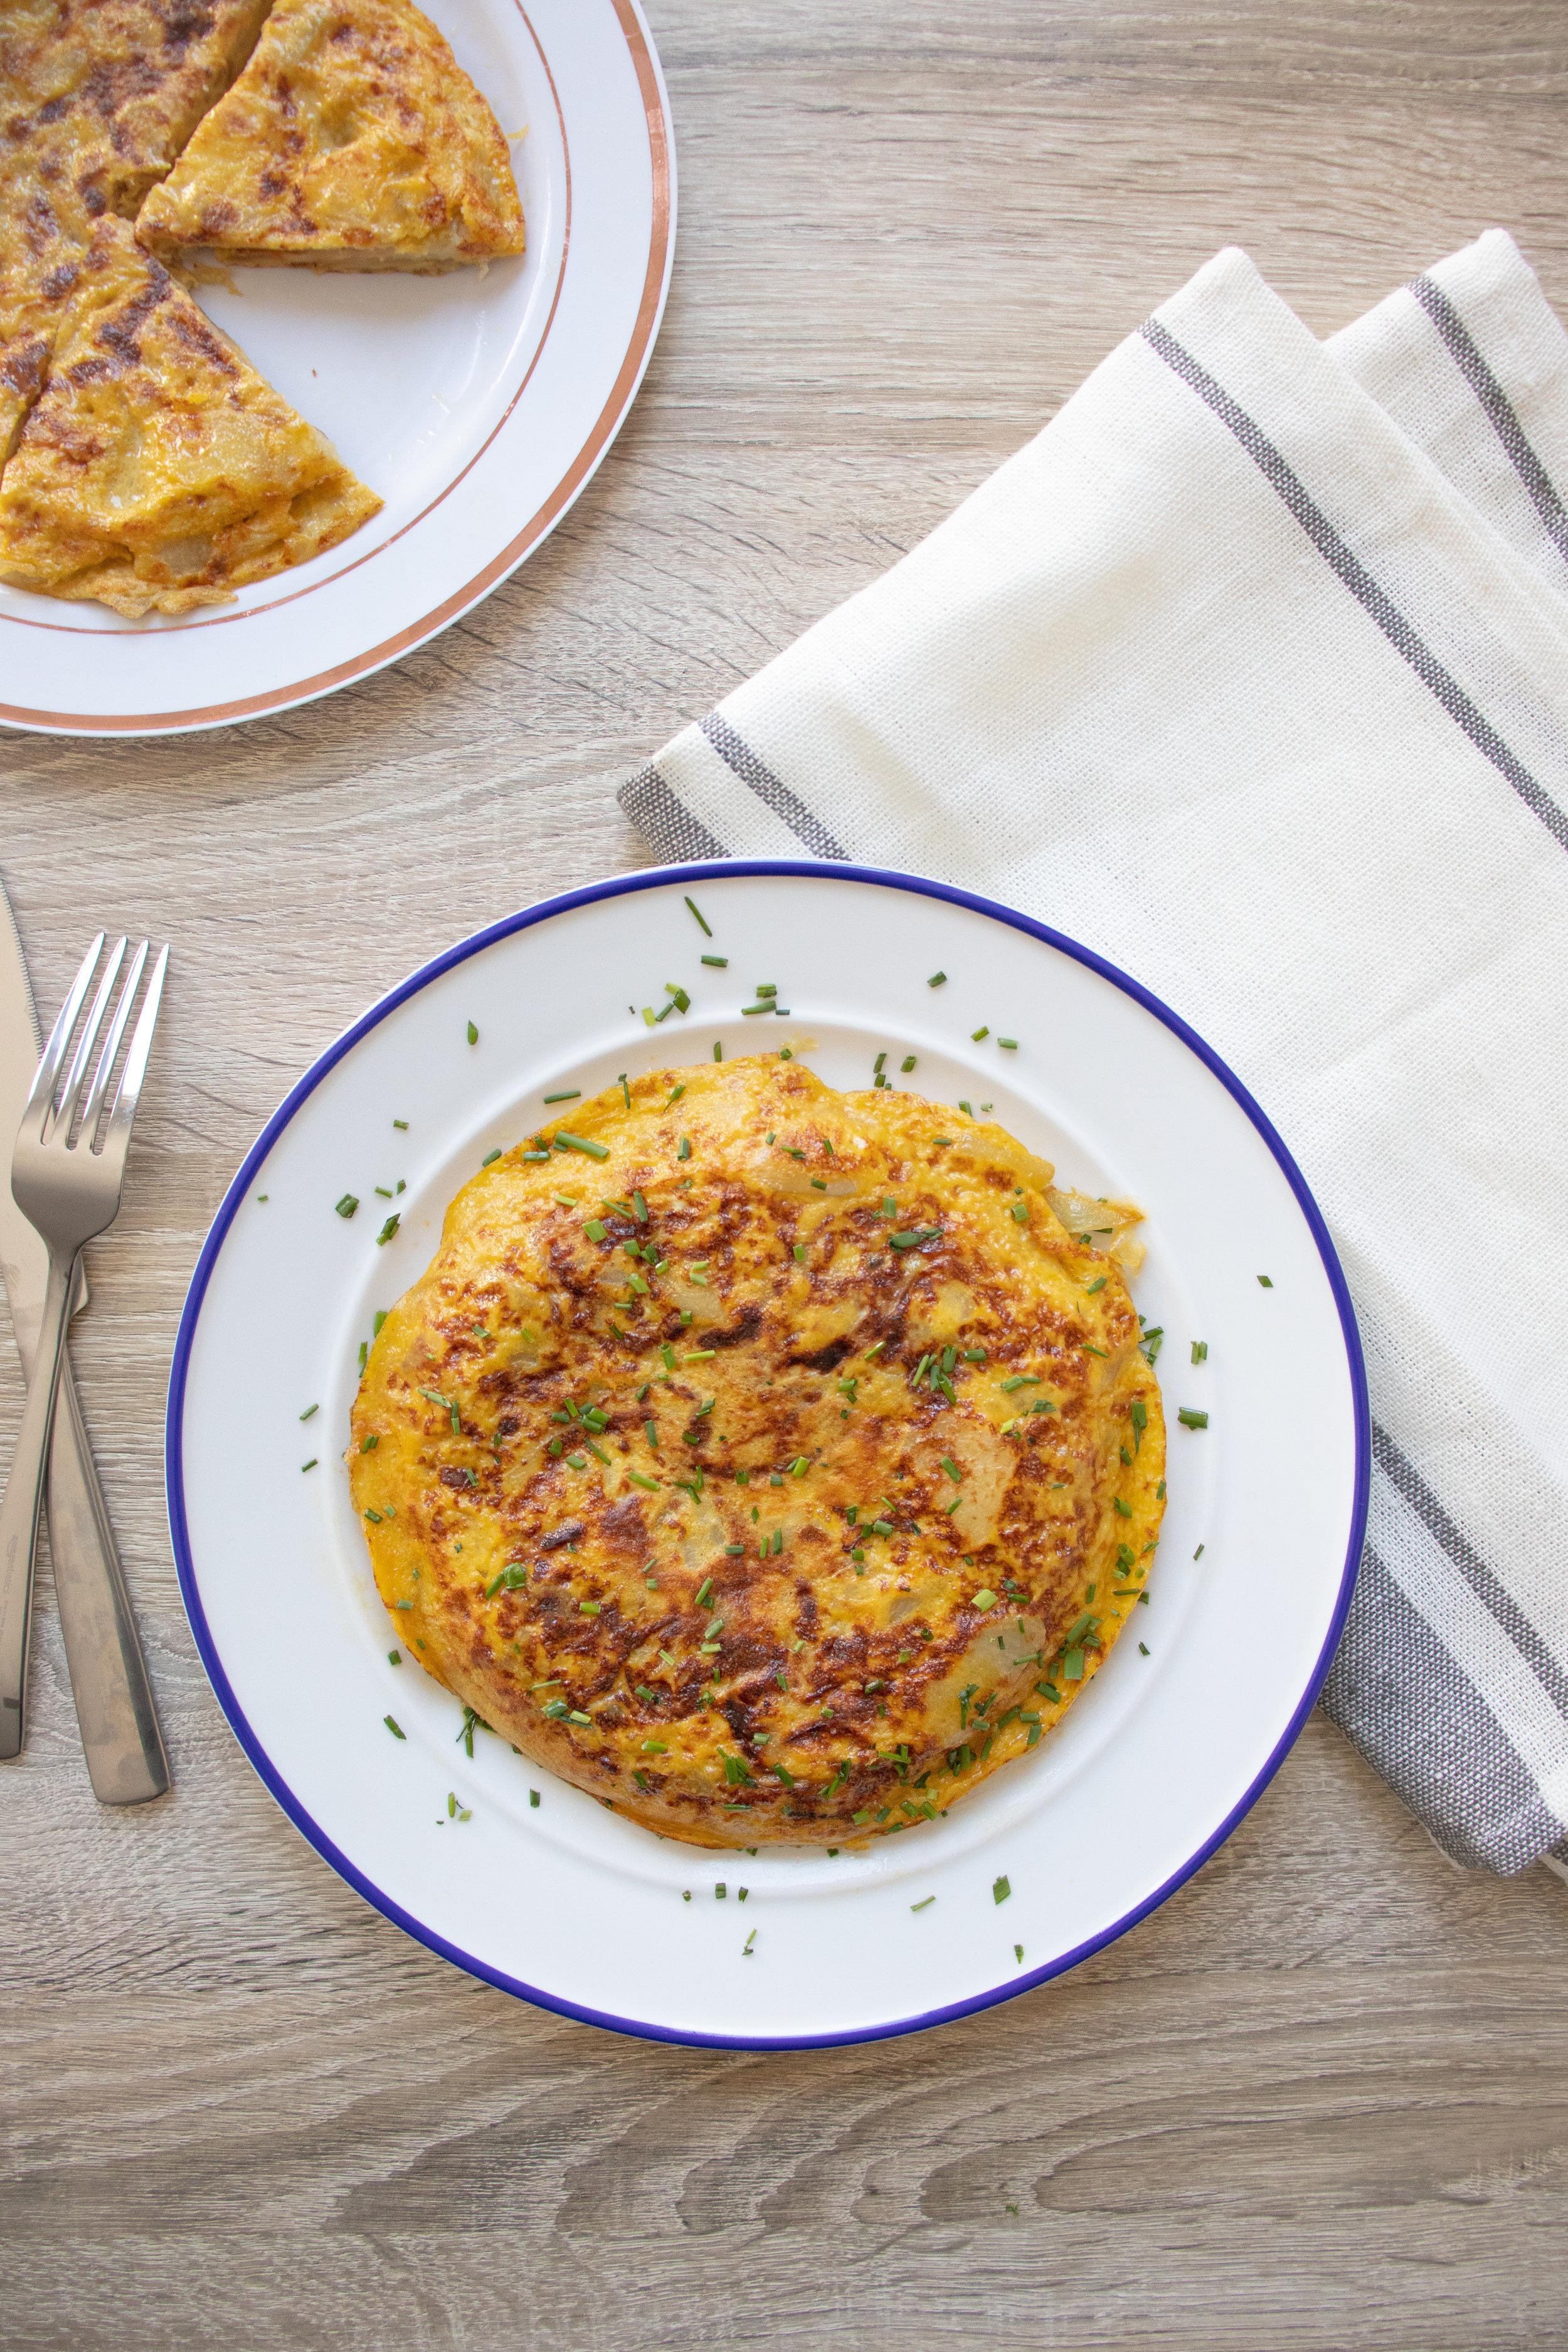 Tortilla Española (Spanish Omelette)